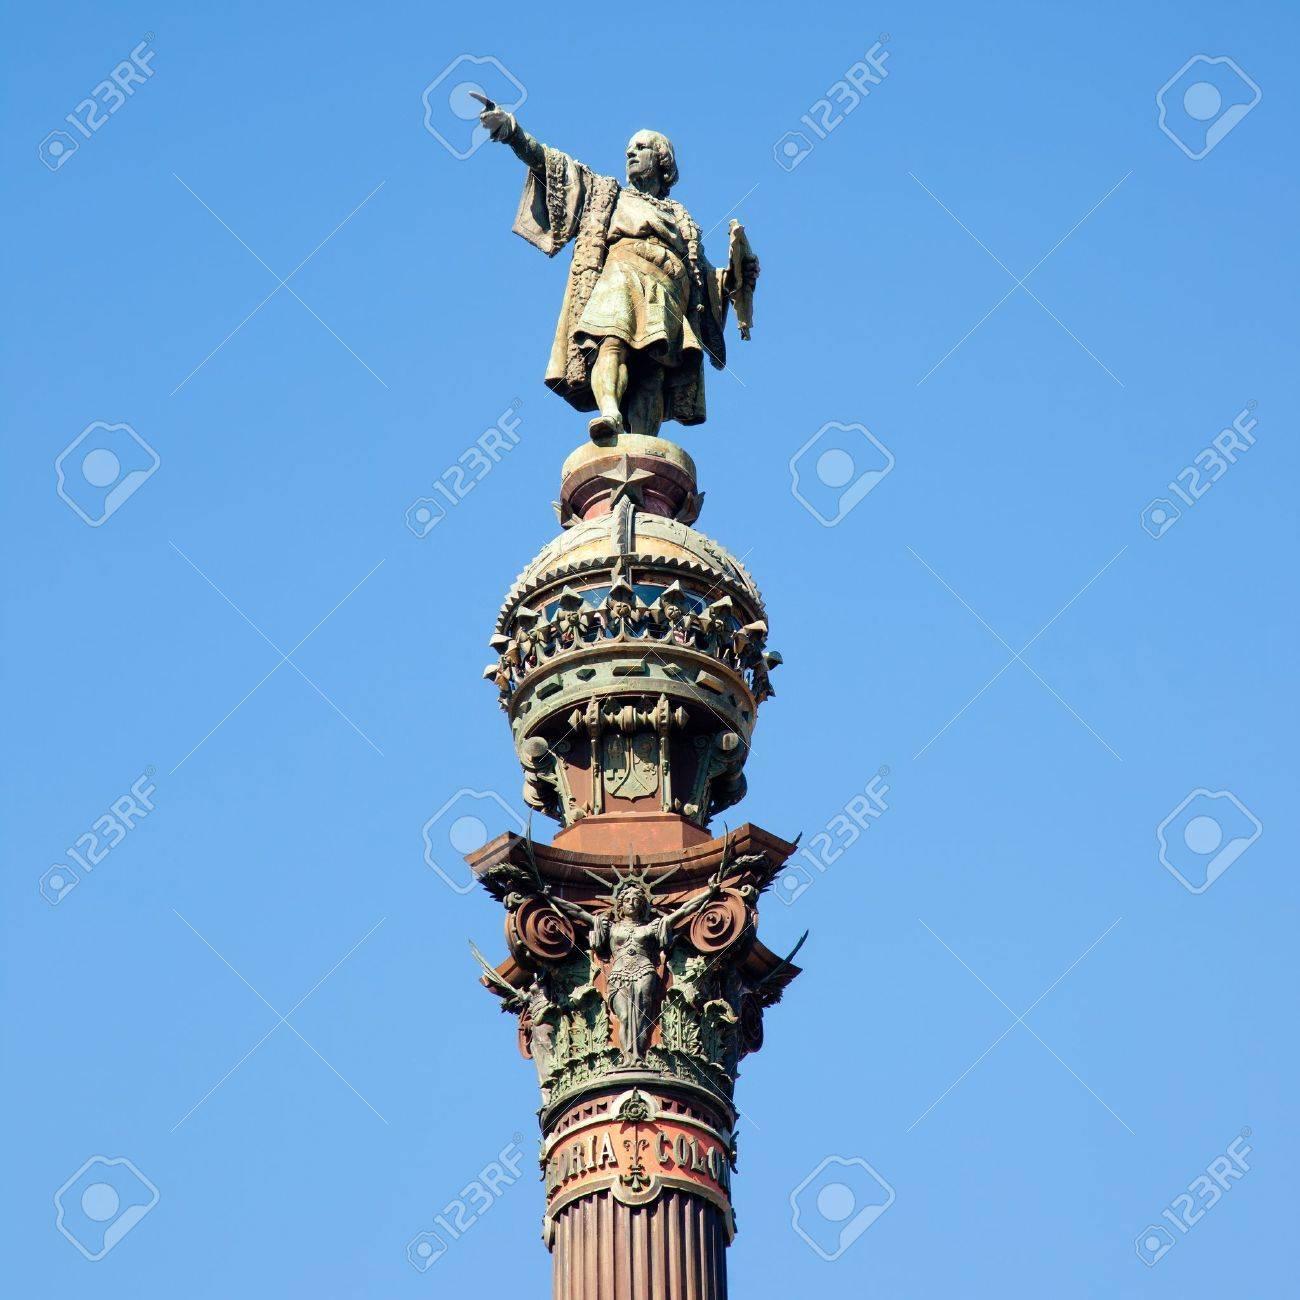 Barcelona Cristobal Colon square statue monument on blue sky Stock Photo - 13872795